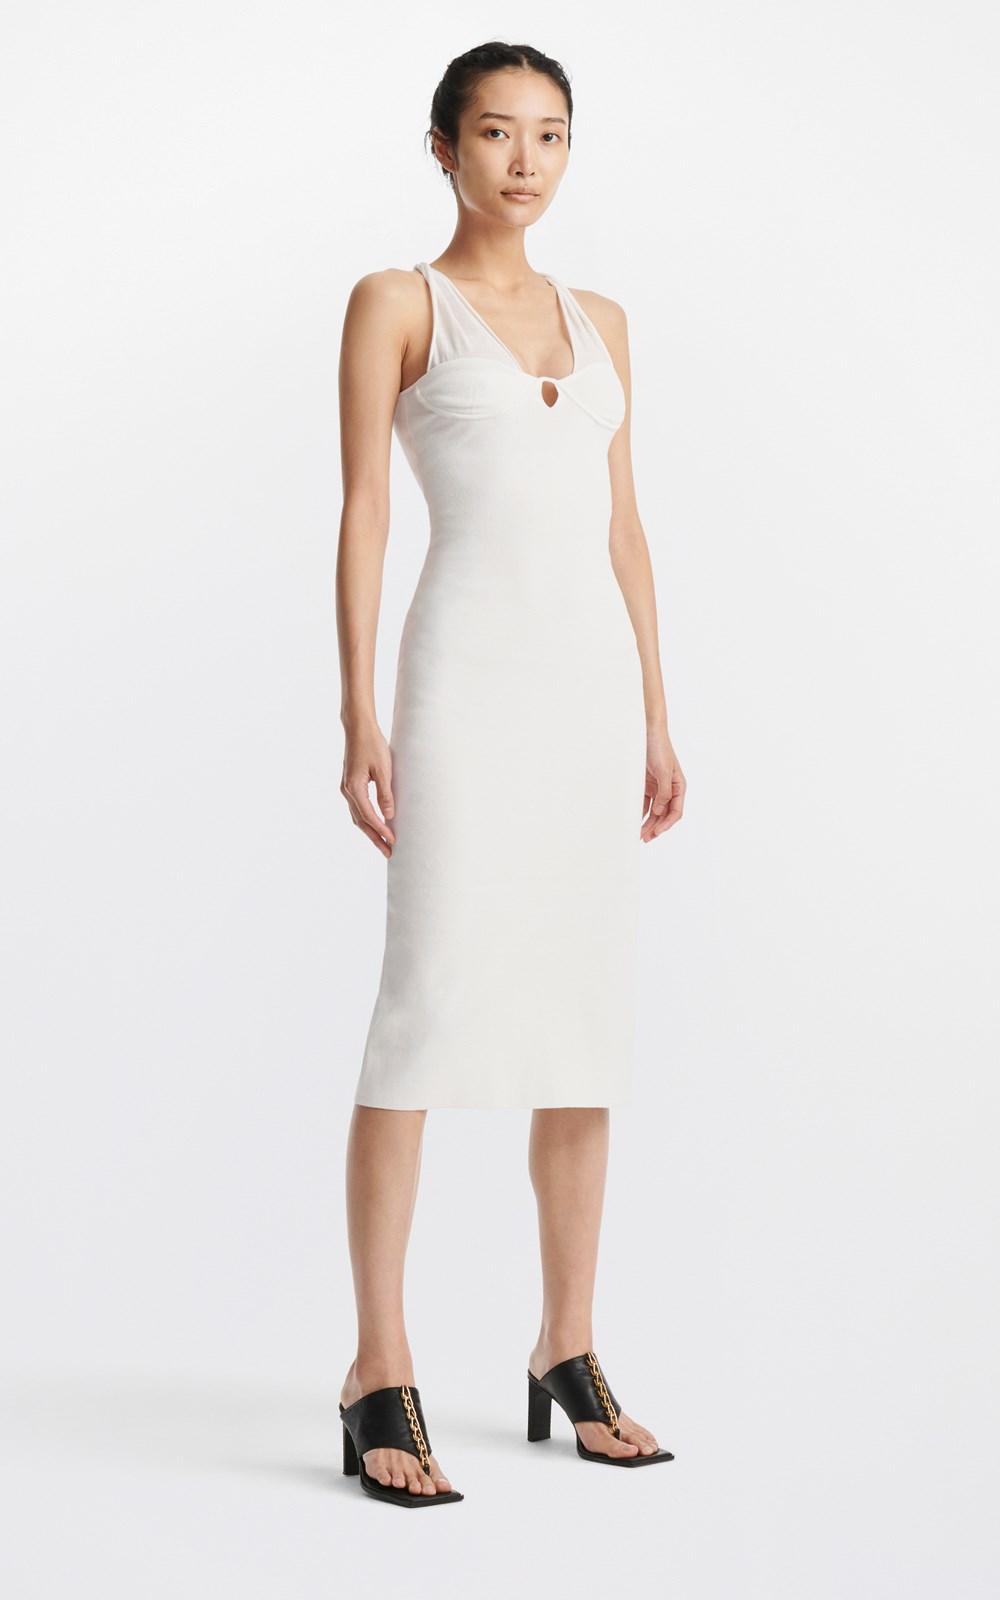 Dresses | COTTON TUBE TWIST DRESS